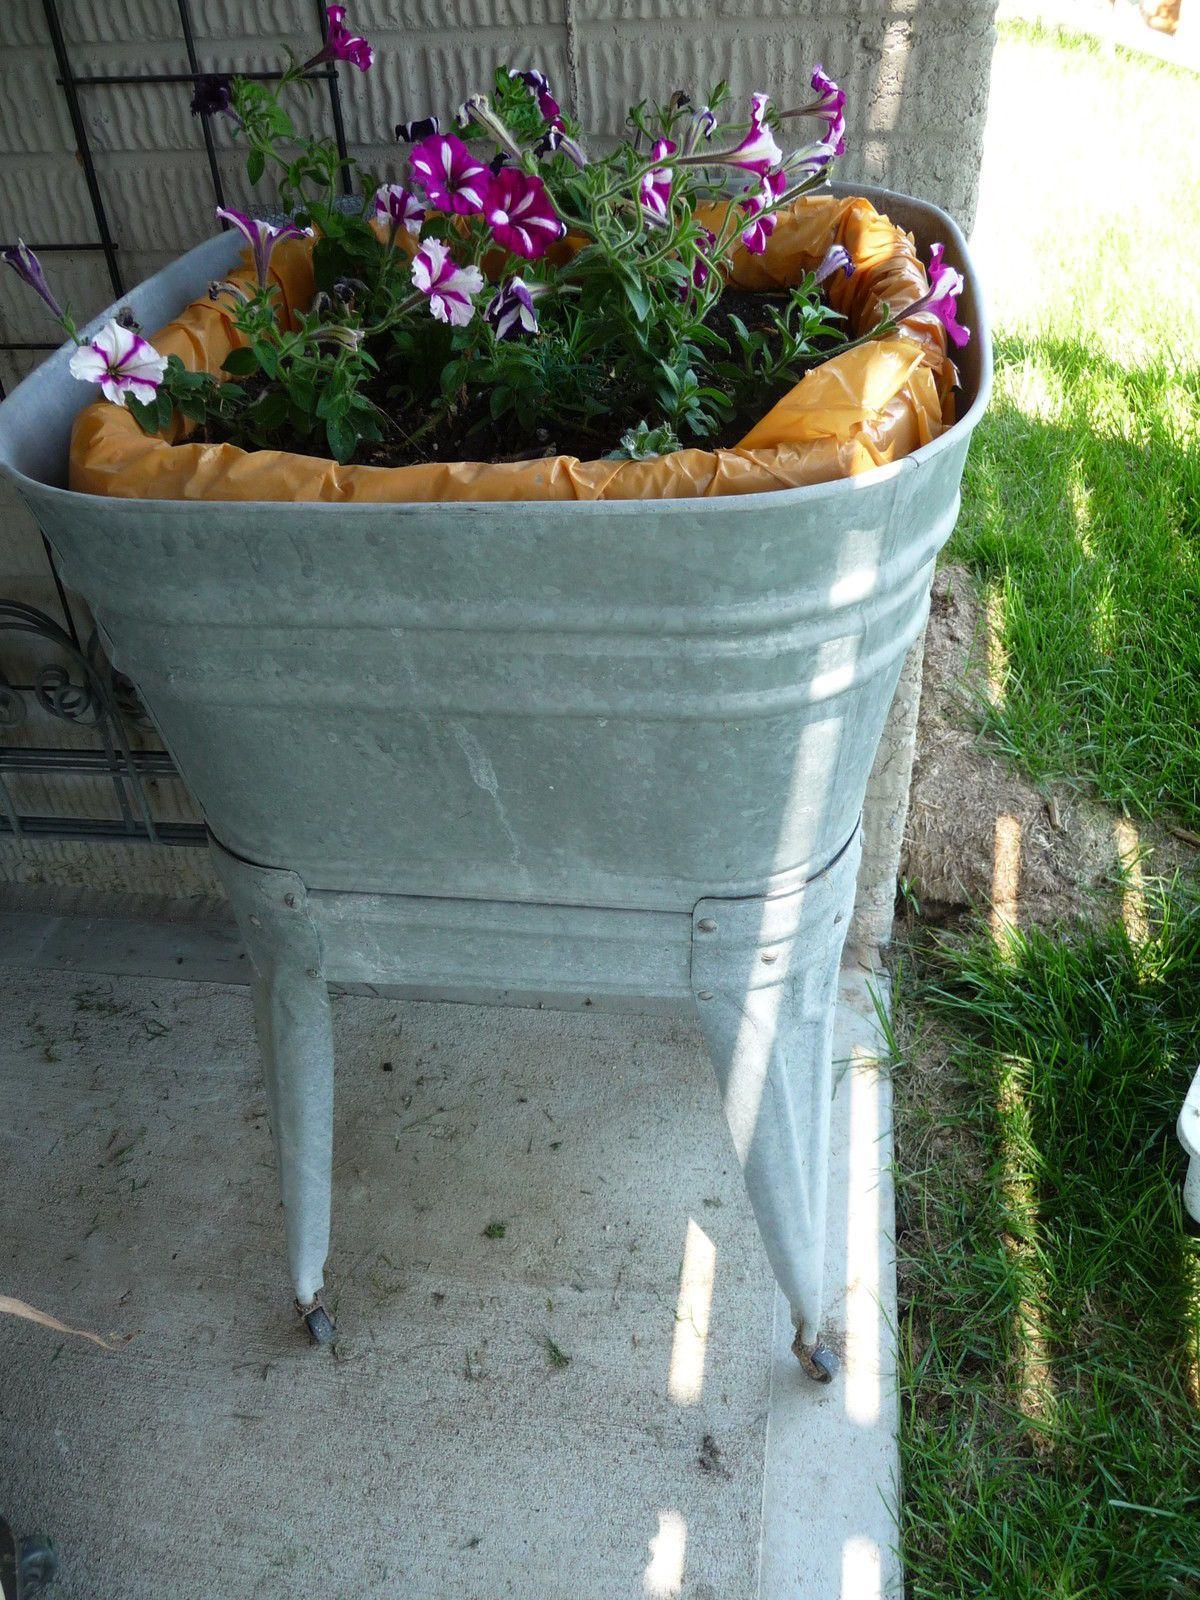 Large Galvanized Metal Tub On Wheels By Evergreen Enterprises Inc - Old galvanized wash tub with legs ebay